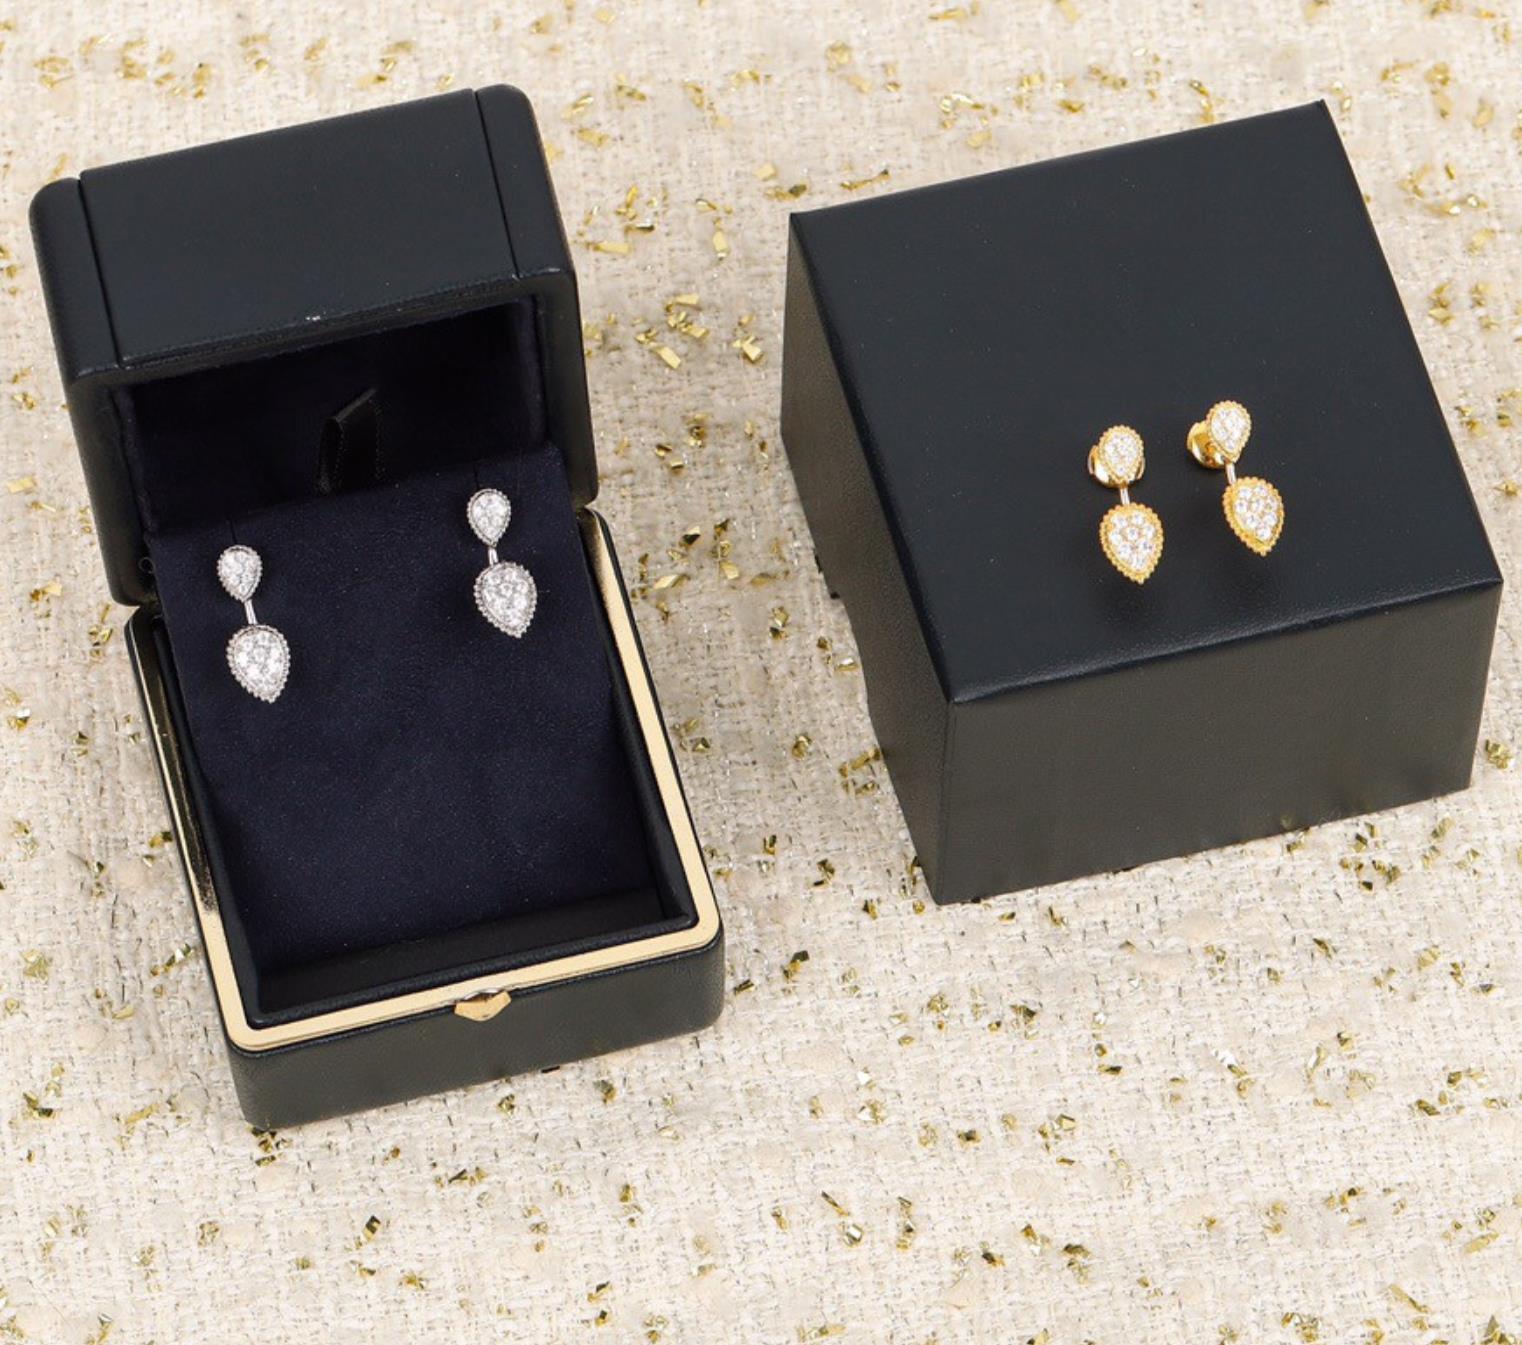 Top Famous Brand Pure 925 Sterling Silver Fine Jewelry For Women Zircon Water Drop Luxury Gold Color Earrings Europ Design Gift